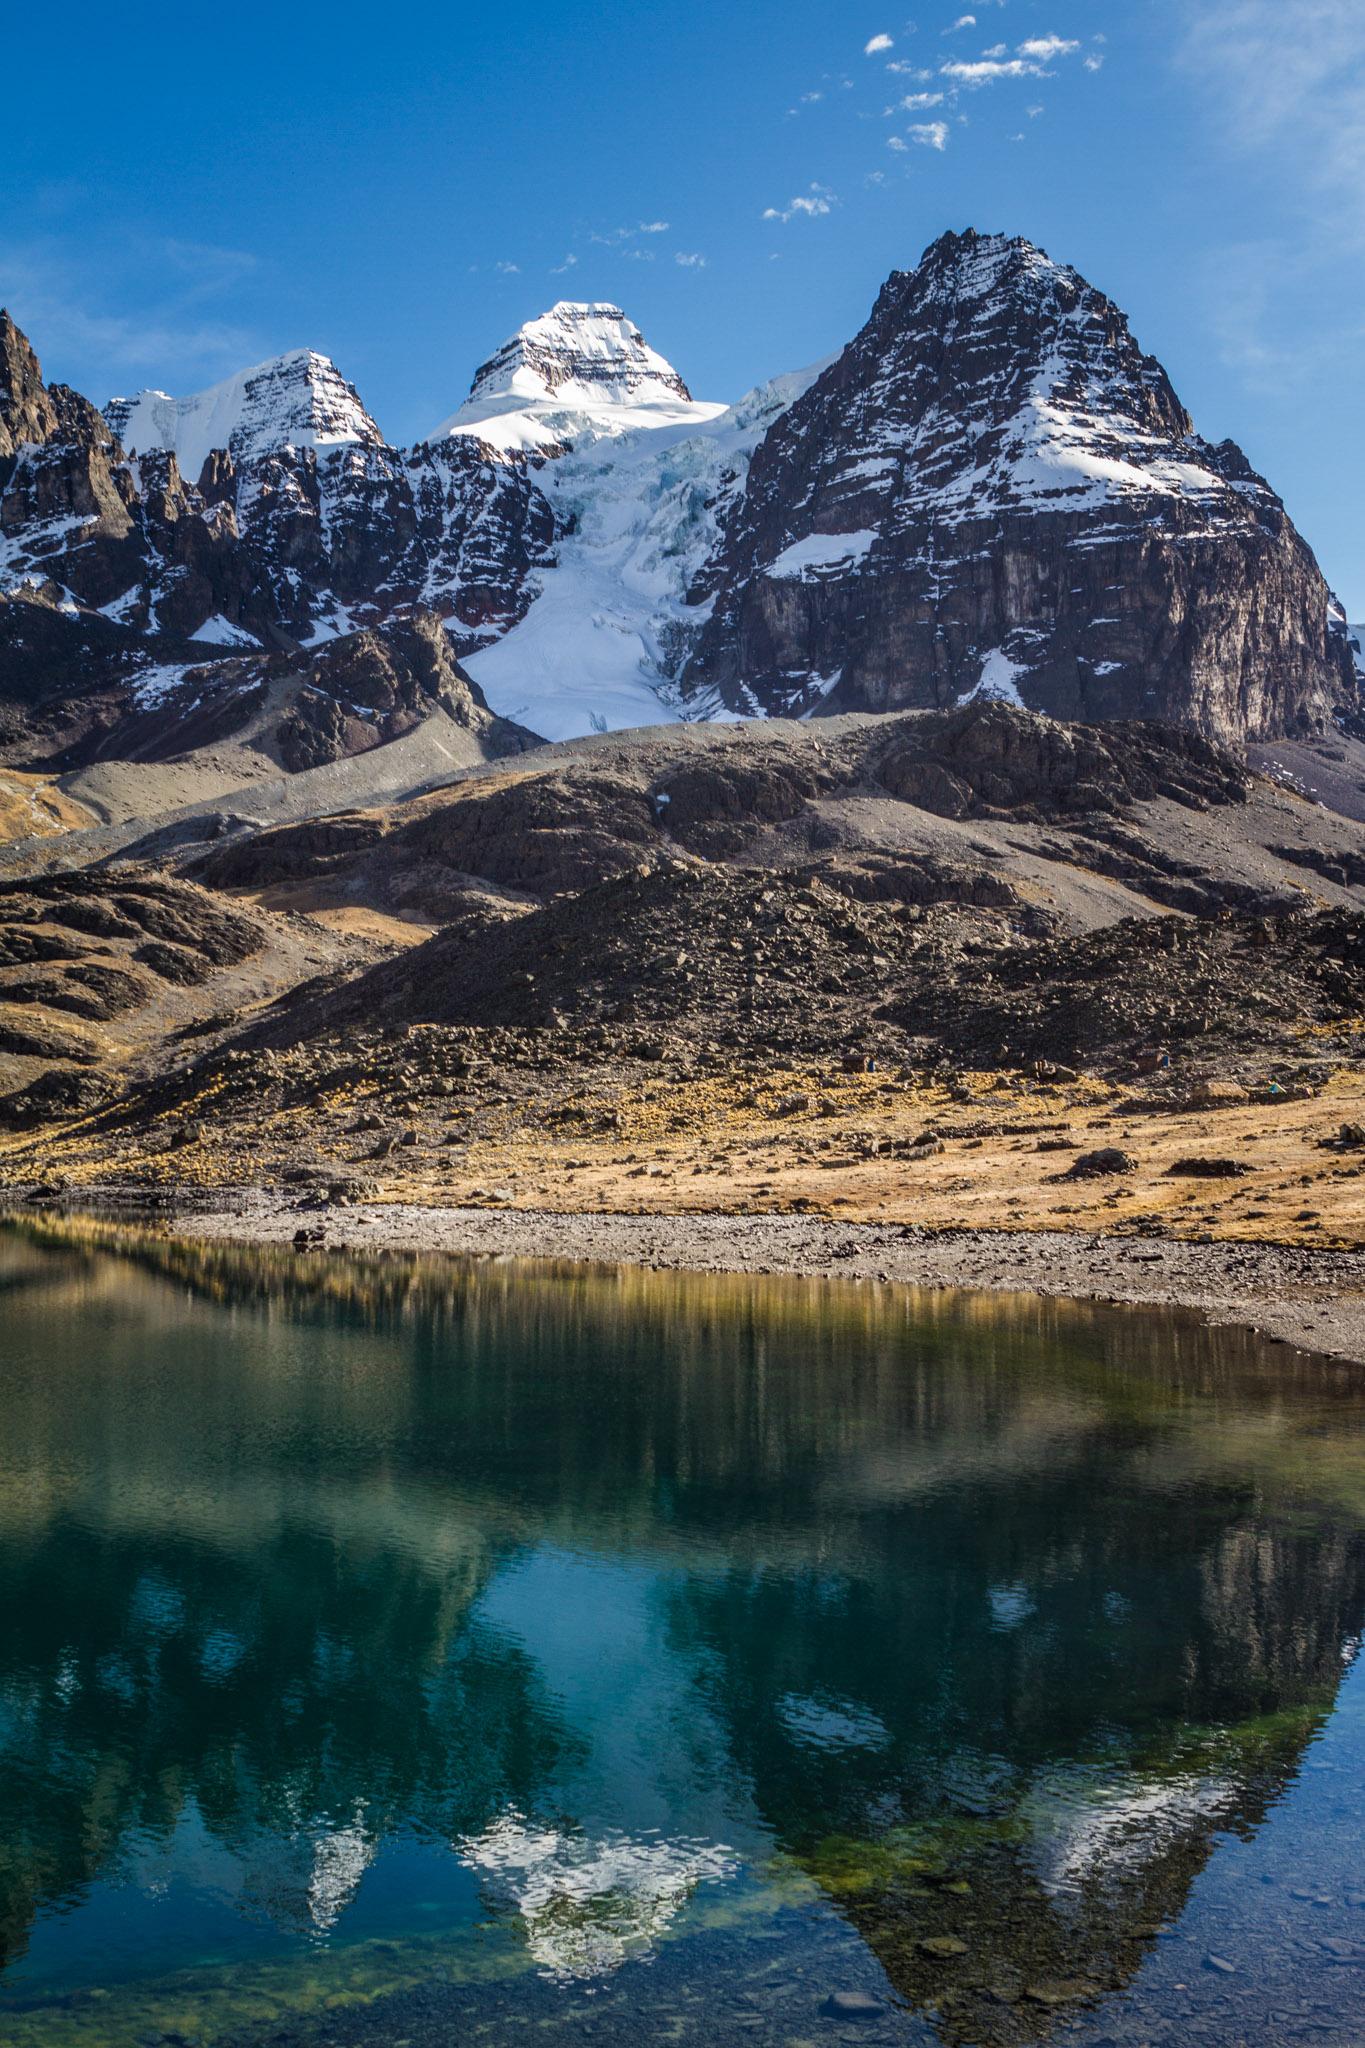 Ali-Barqawi-Studios-Explore-Series-Travel-Adventure-Documentary-C4CGAZA-Bolivia-Mount-Tarija-2015-233.jpg